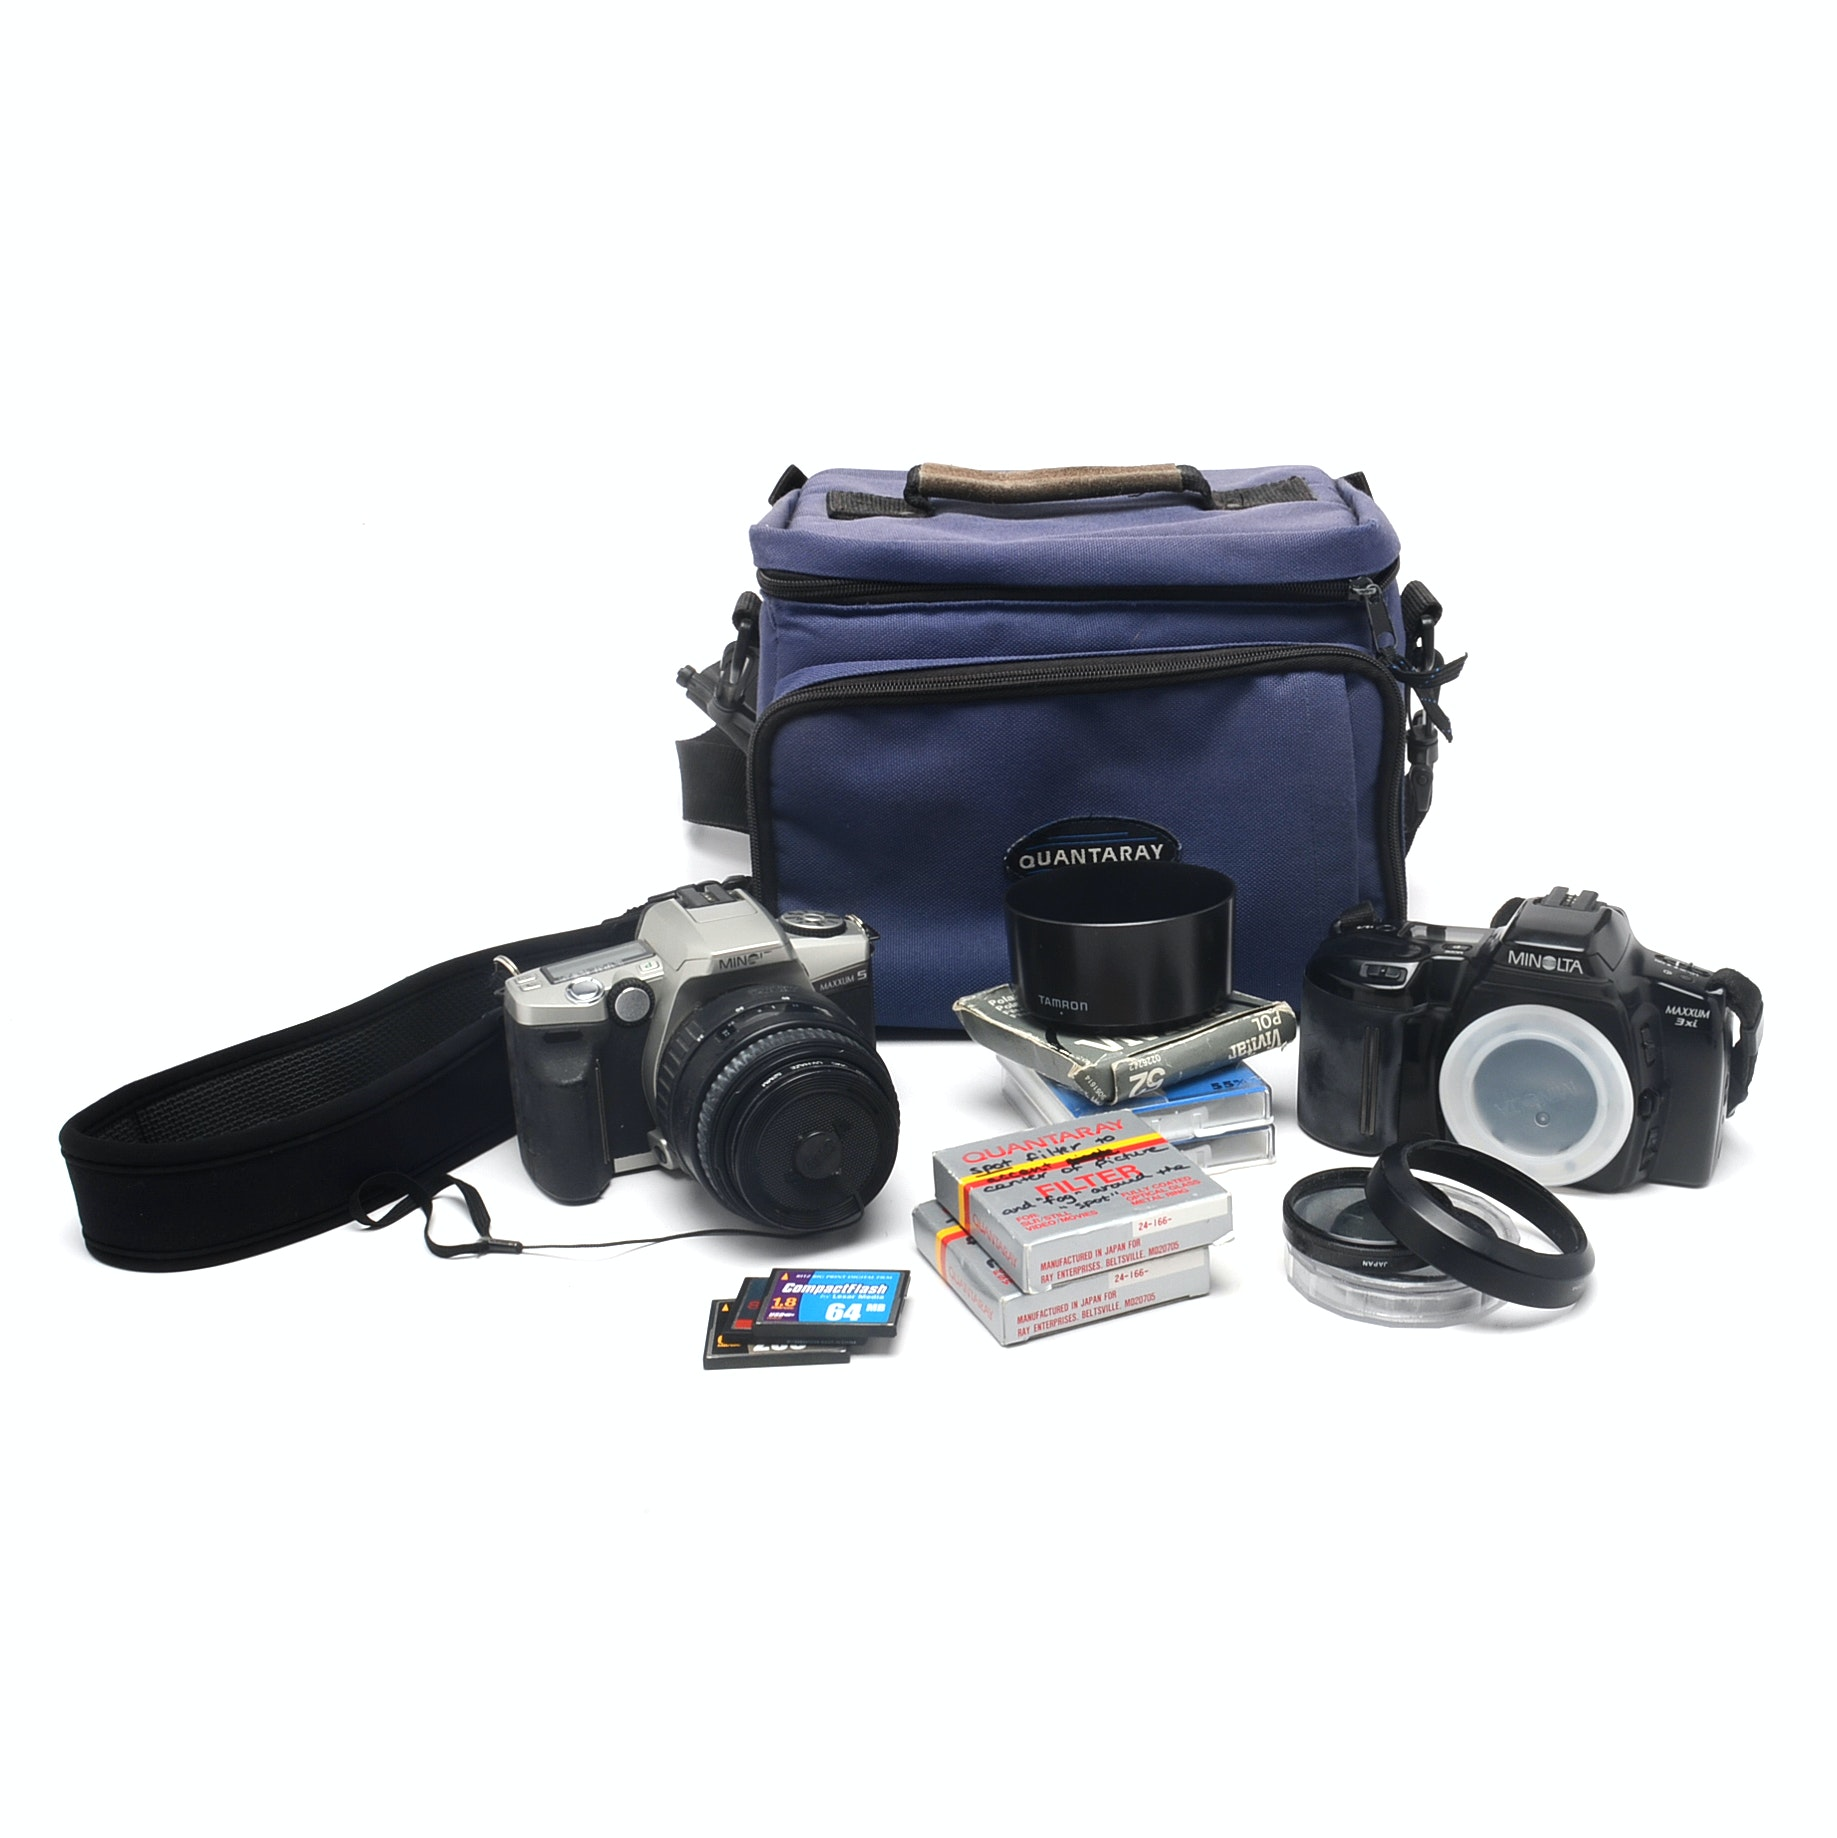 "Minolta ""Maxxum"" 35mm Film Cameras With Accessories"